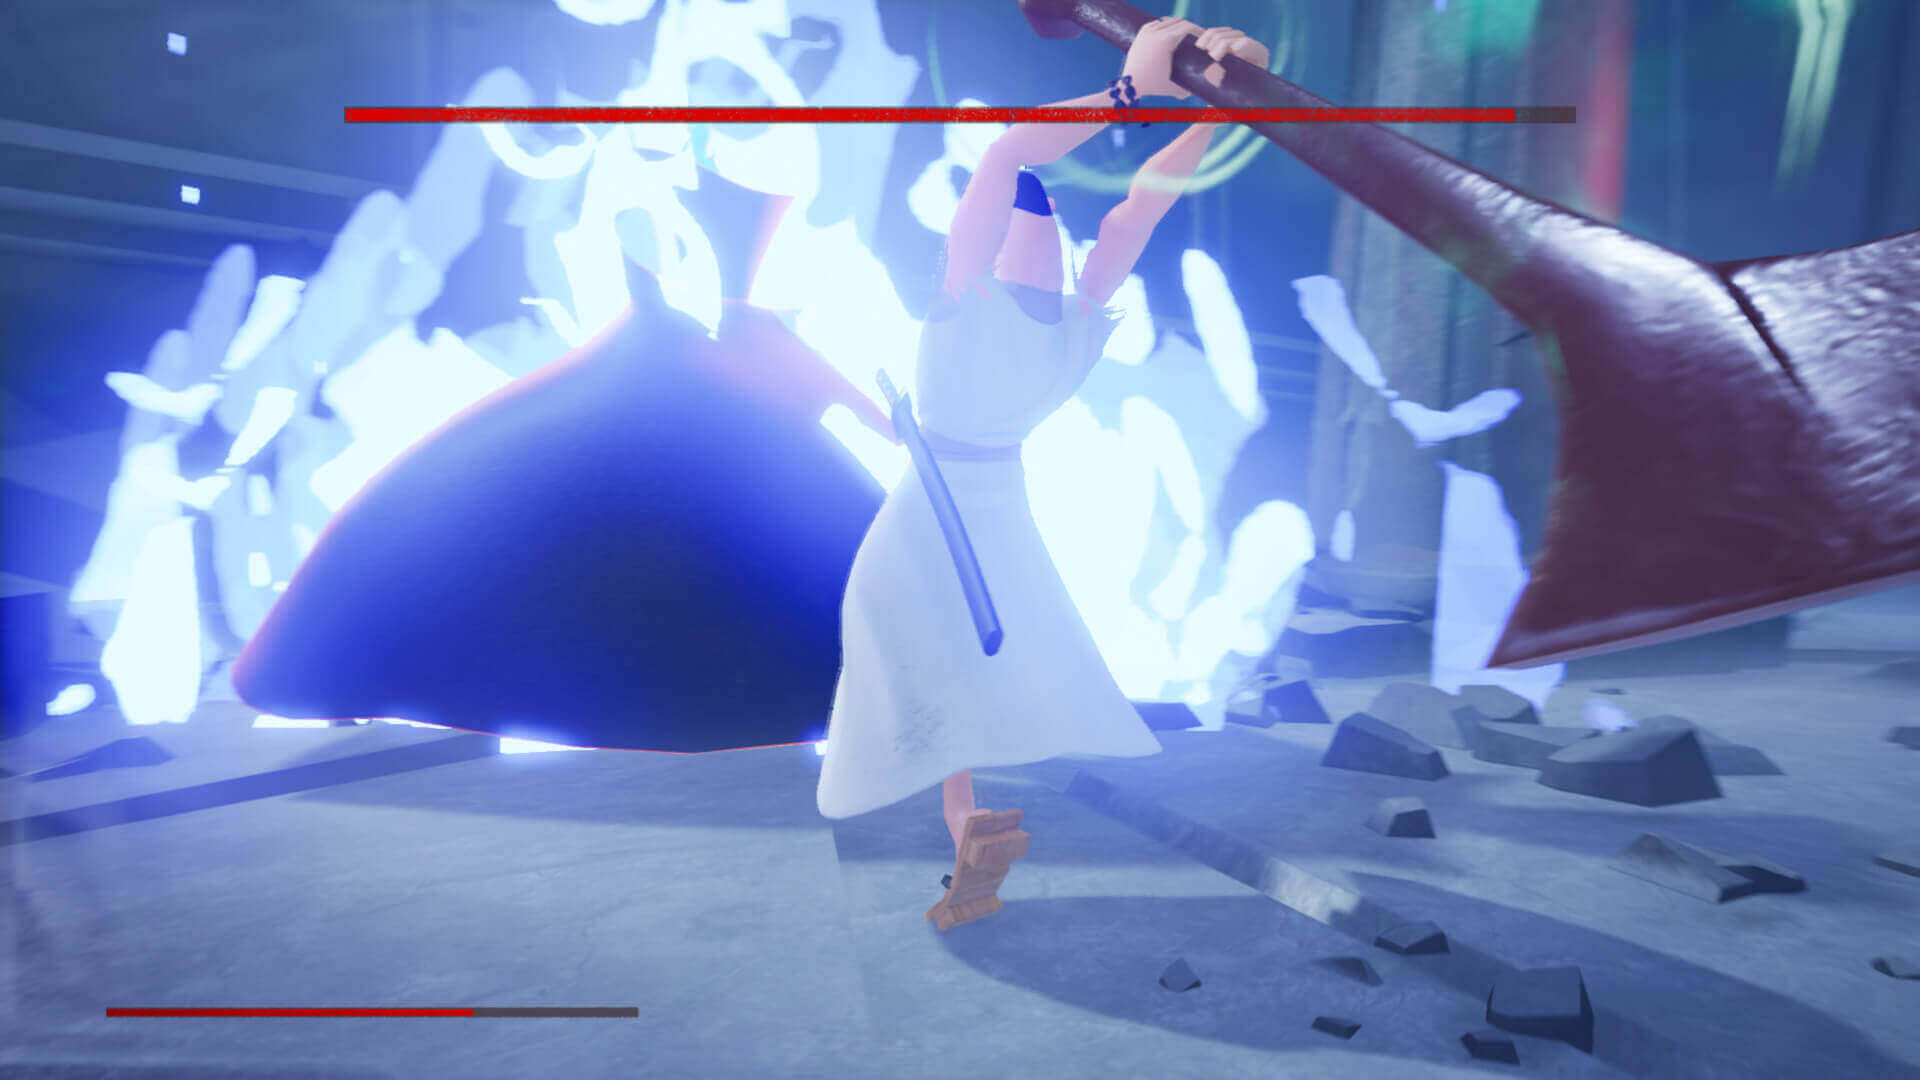 Análise Samurai Jack: Battle Through Time, Samurai Jack, Samurai Jack: Battle Through Time, Cartoon Network, Adult Swim